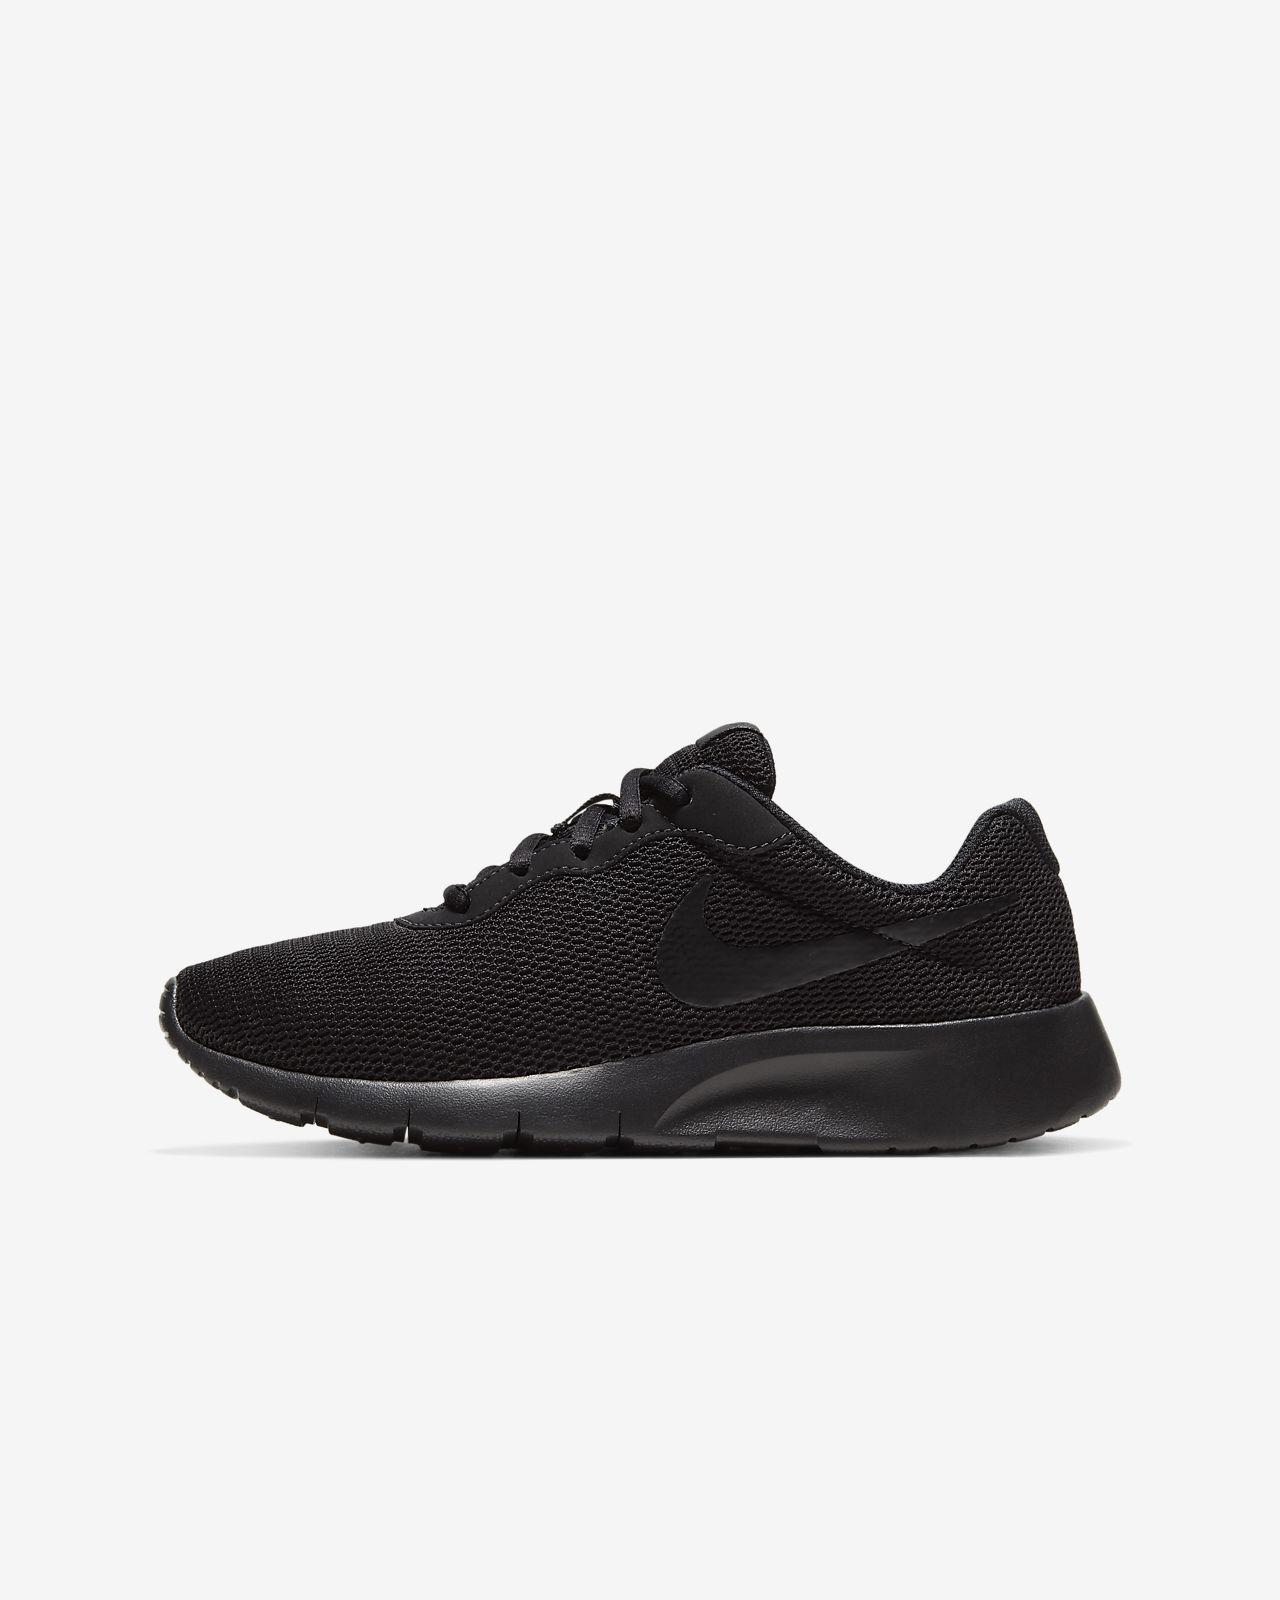 81082e9379 Nike Tanjun Big Kids' Shoe. Nike.com